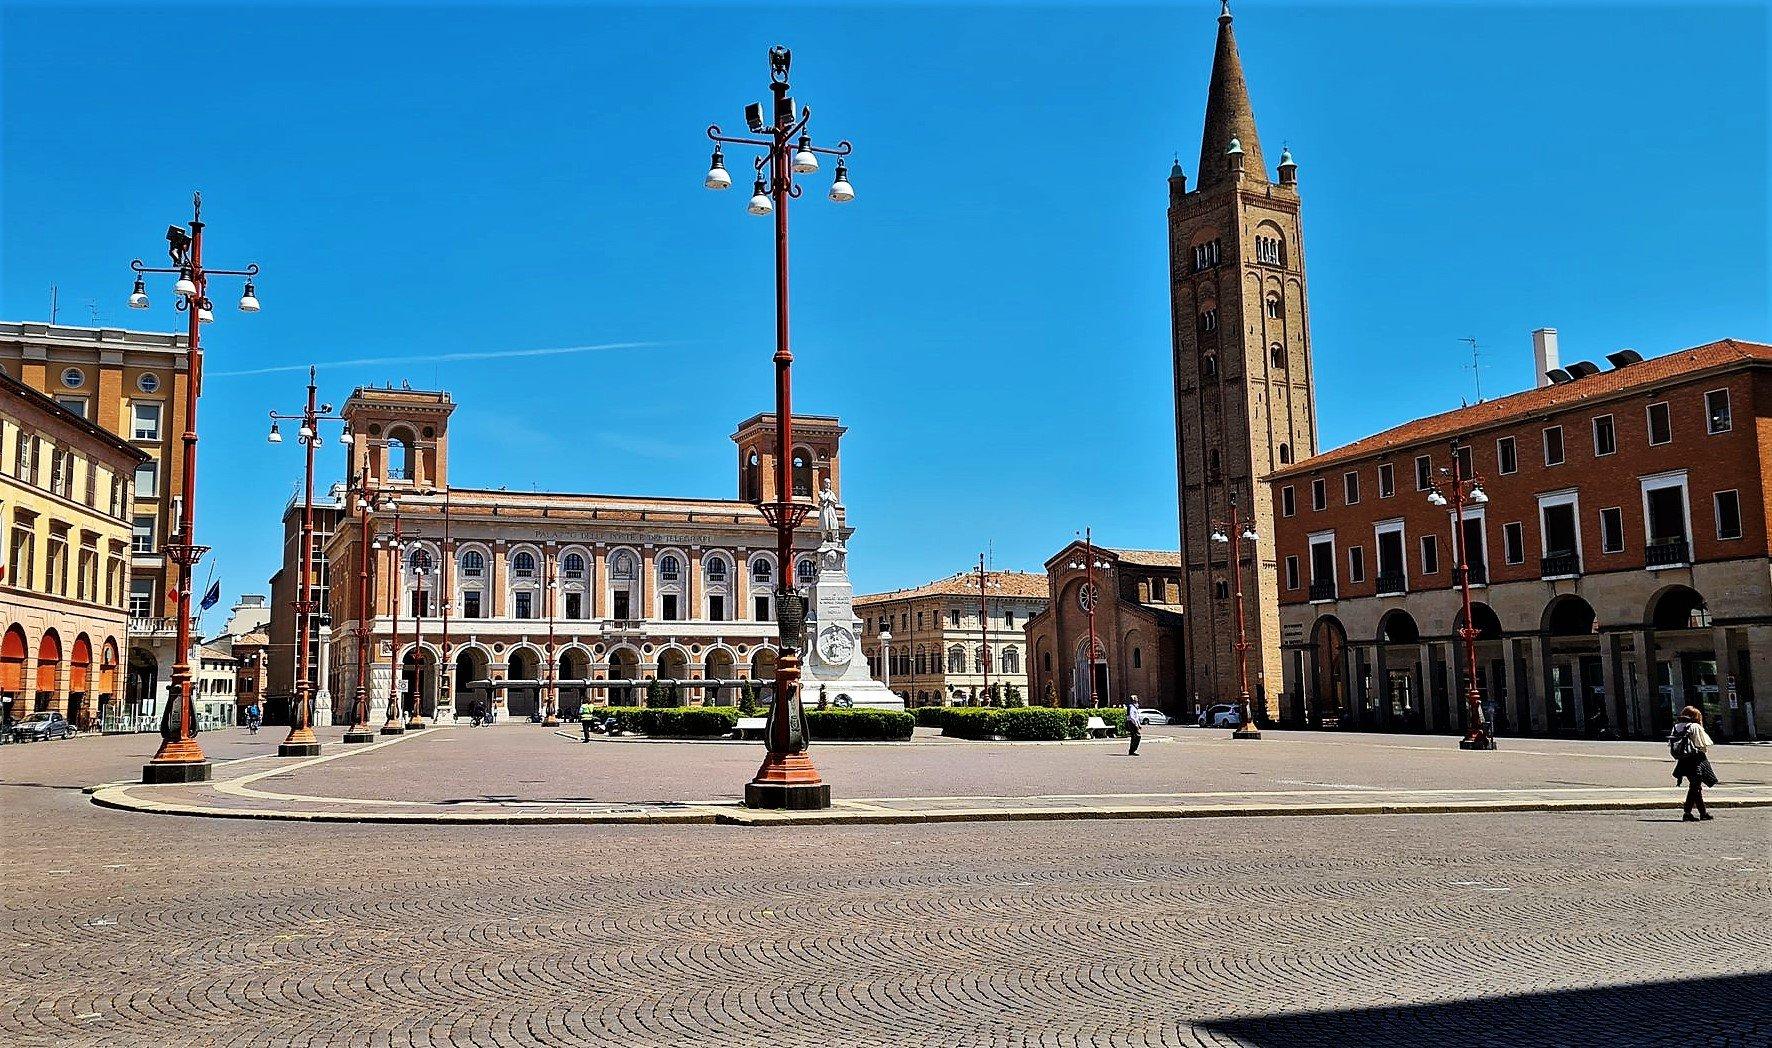 Perchè visitare Forlì in Romagna